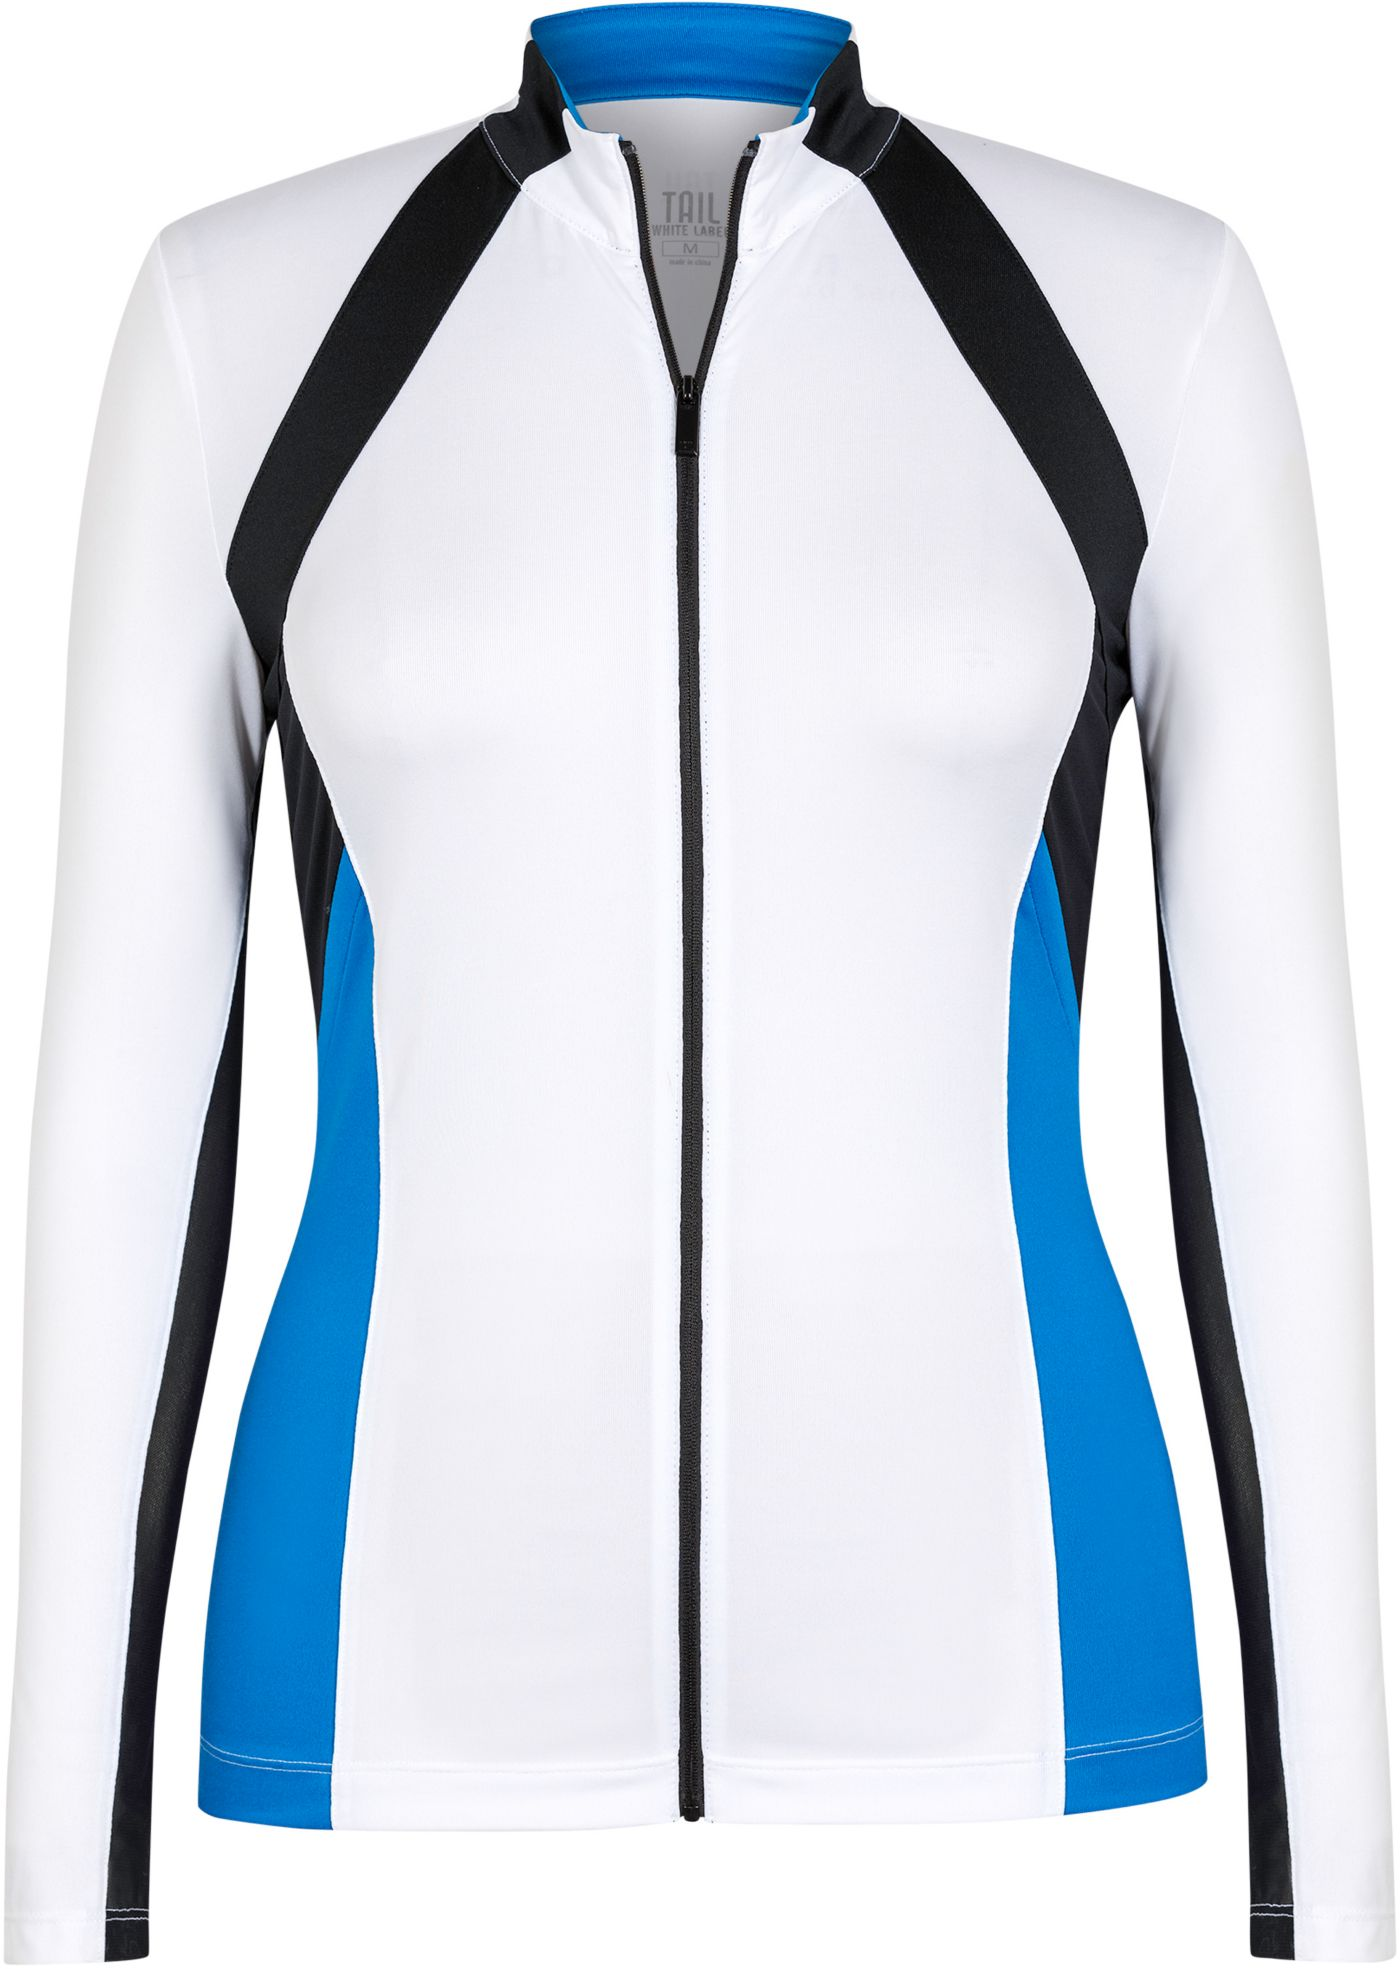 Tail Women's Full-Zip Golf Jacket - Extended Sizes